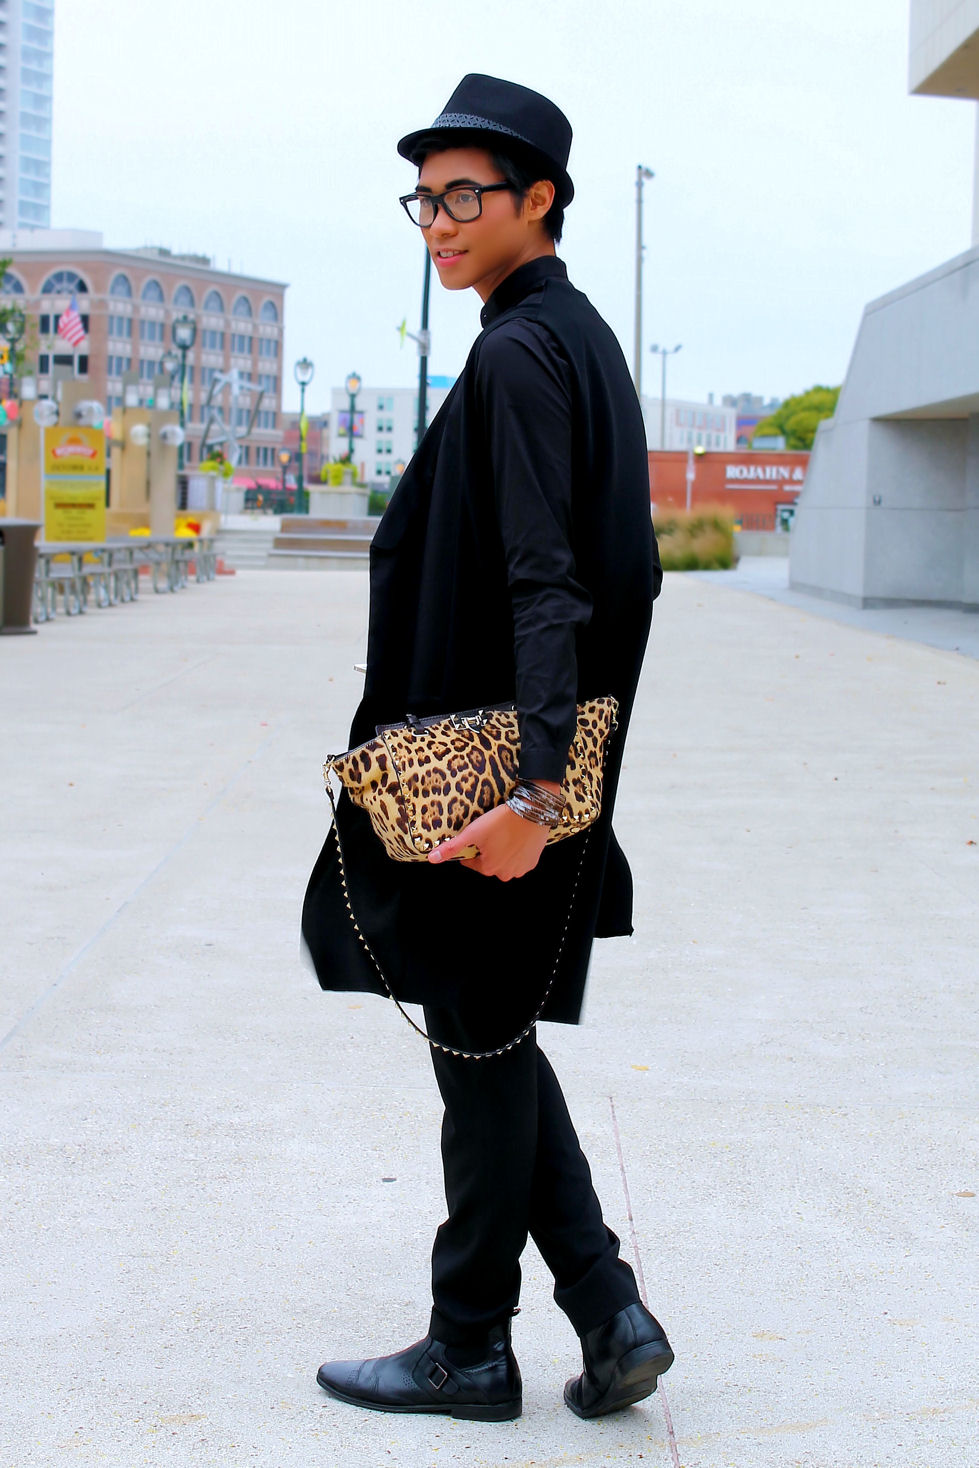 http://ziondejano.blogspot.com/2014/10/a-pop-of-leopard.html